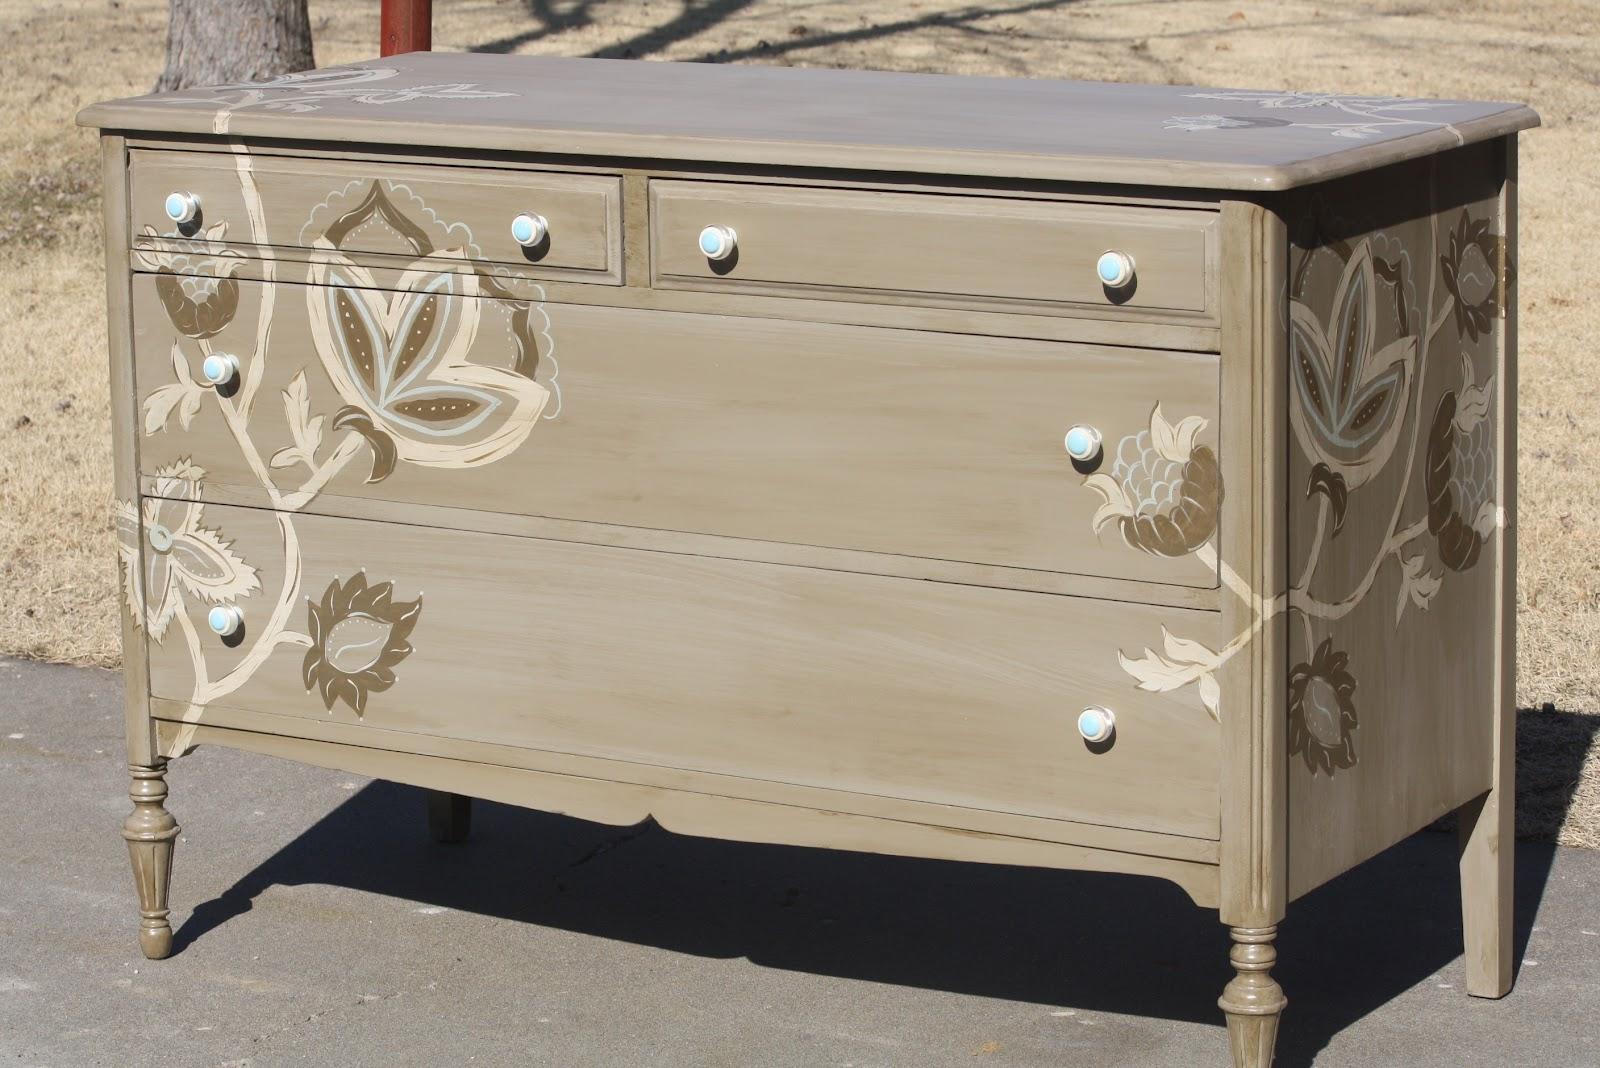 painted floral dresser